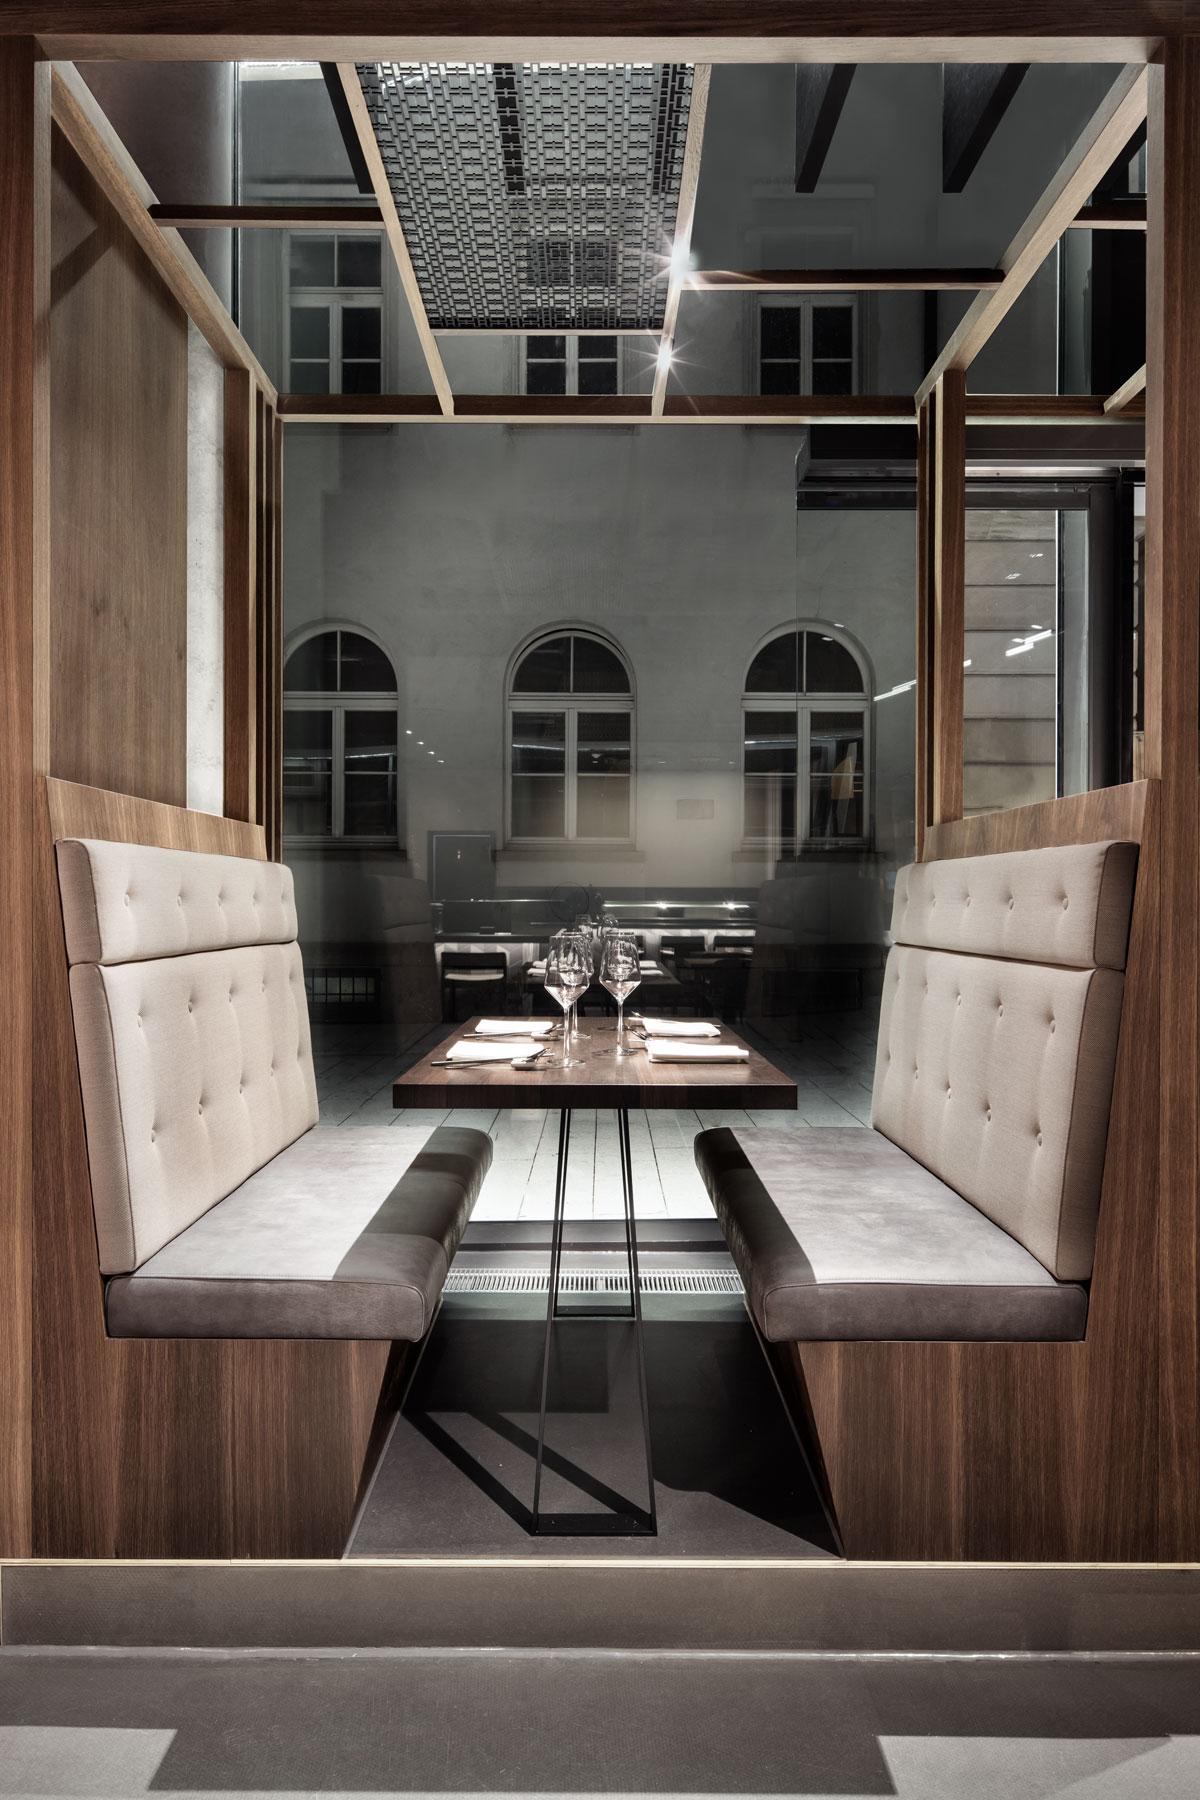 Enso Sushi & Grill, Sitzecke